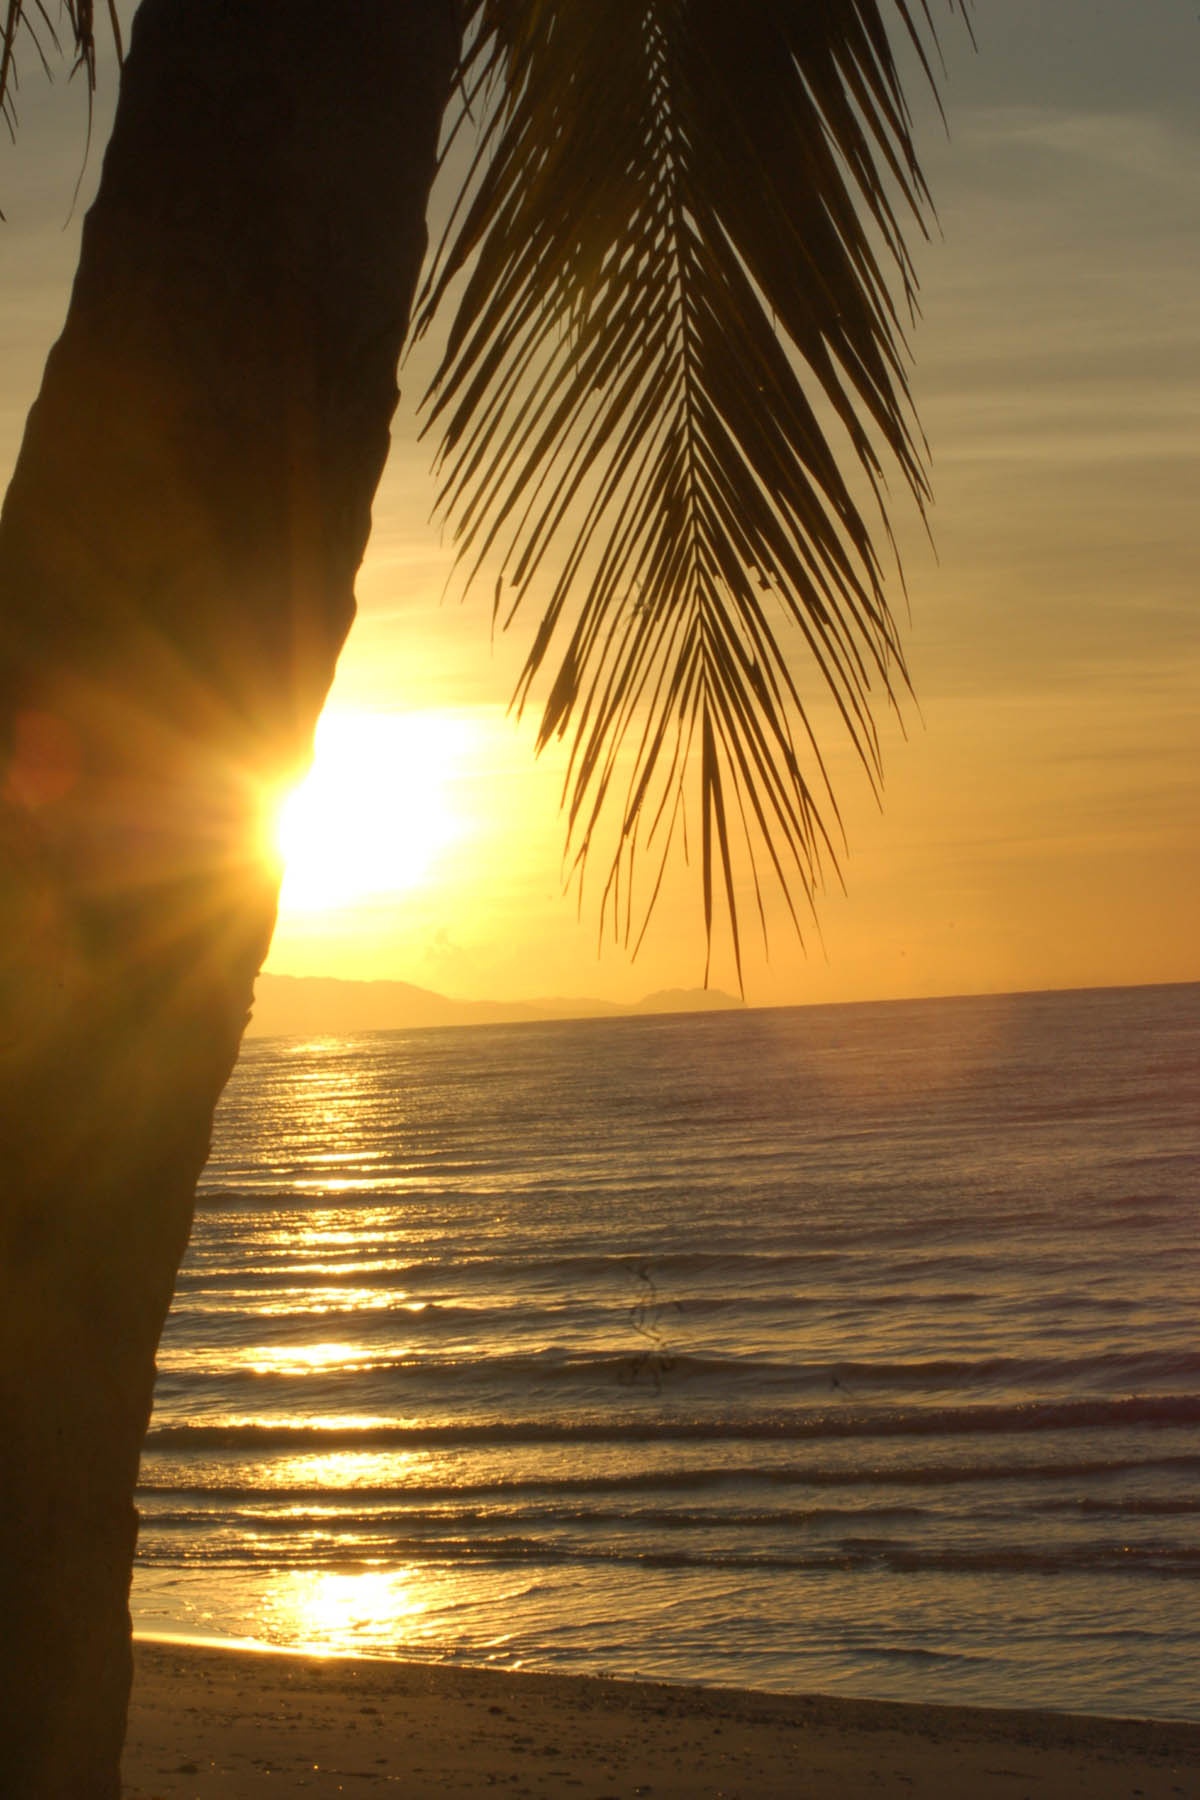 Sunrise, Beach, Bspo06, Coconut, Leaves, HQ Photo